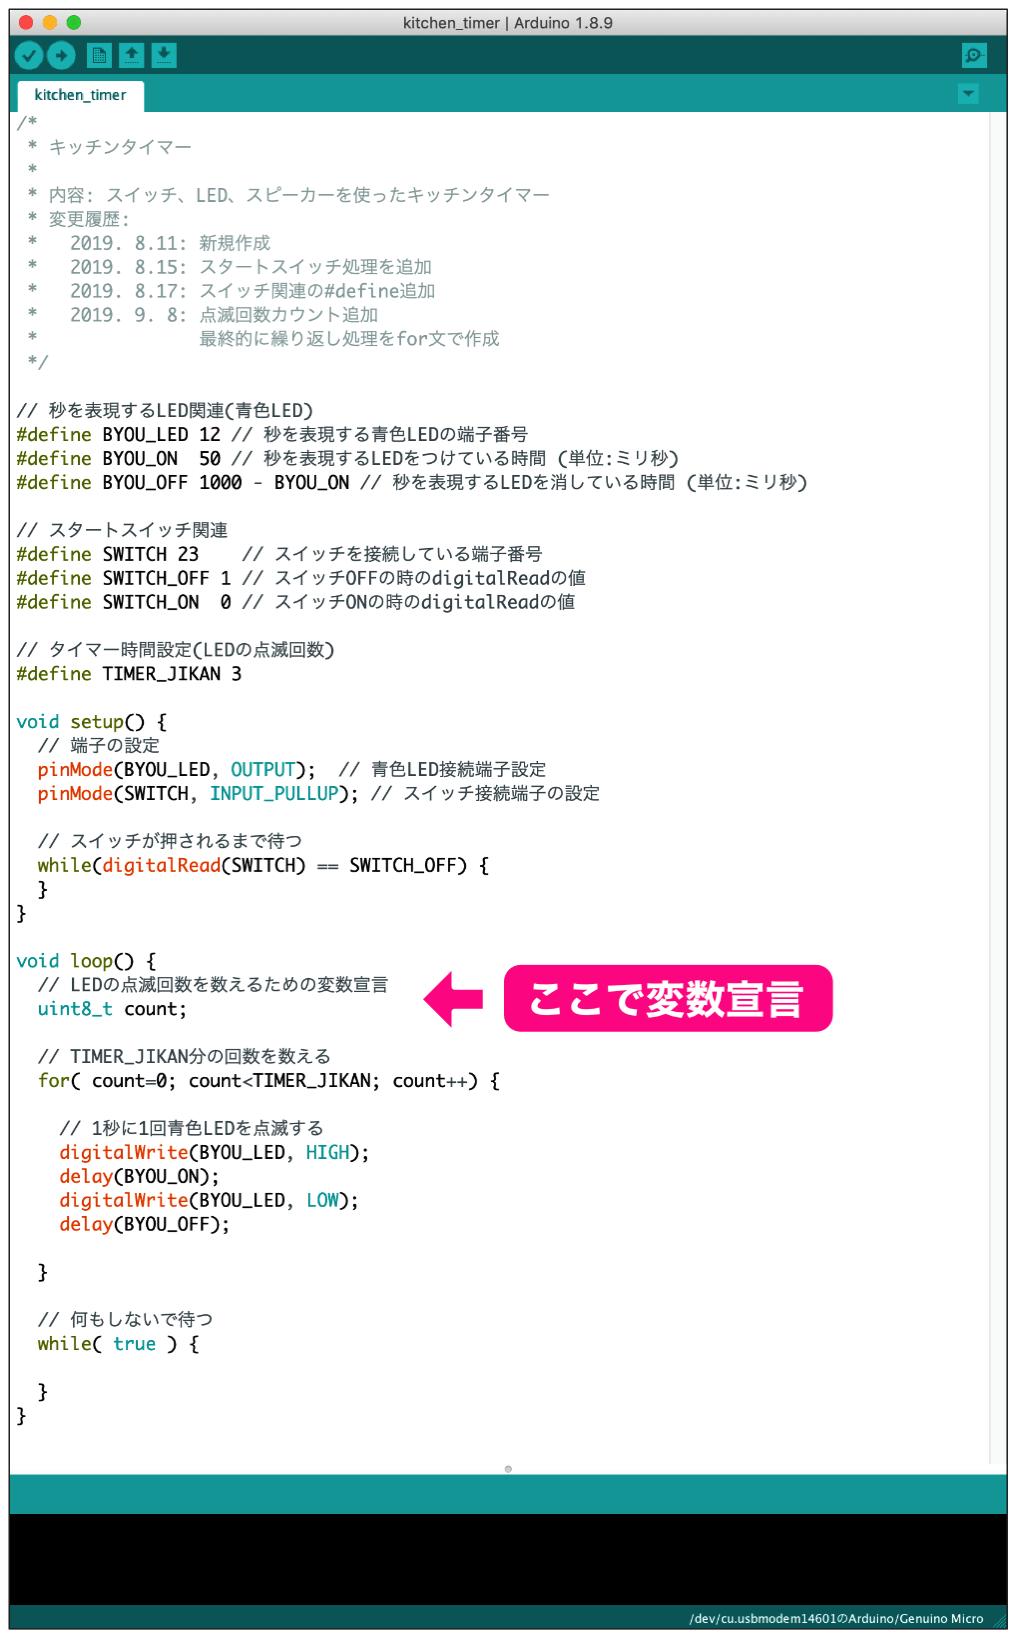 loop内の変数宣言